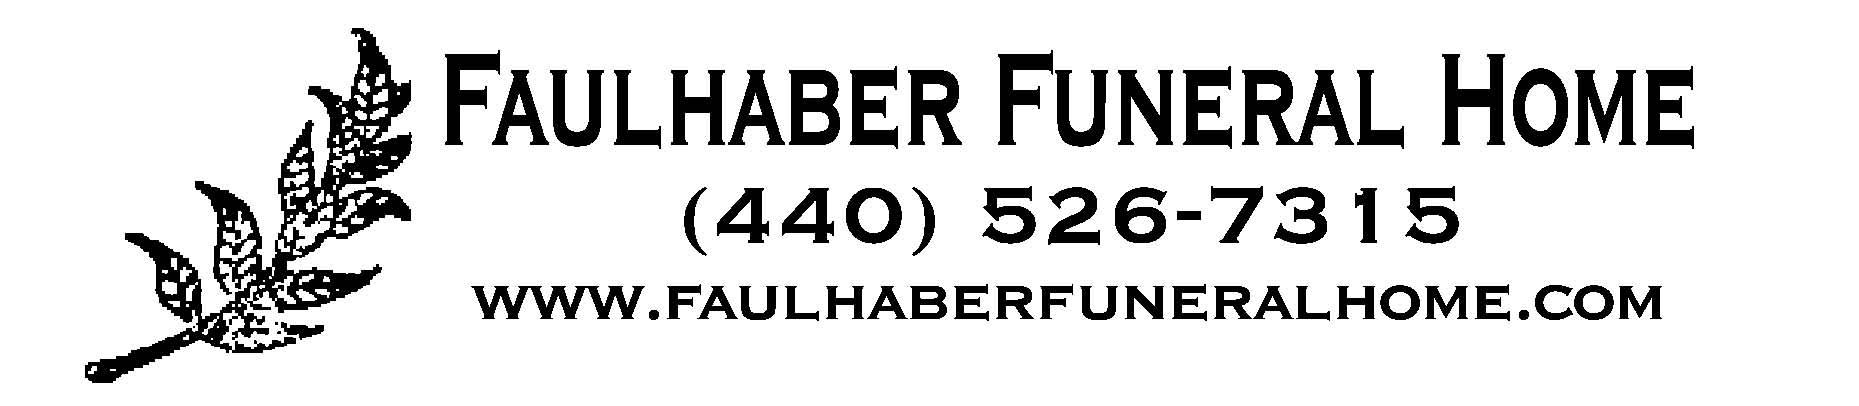 Faulhaber funeral home logo